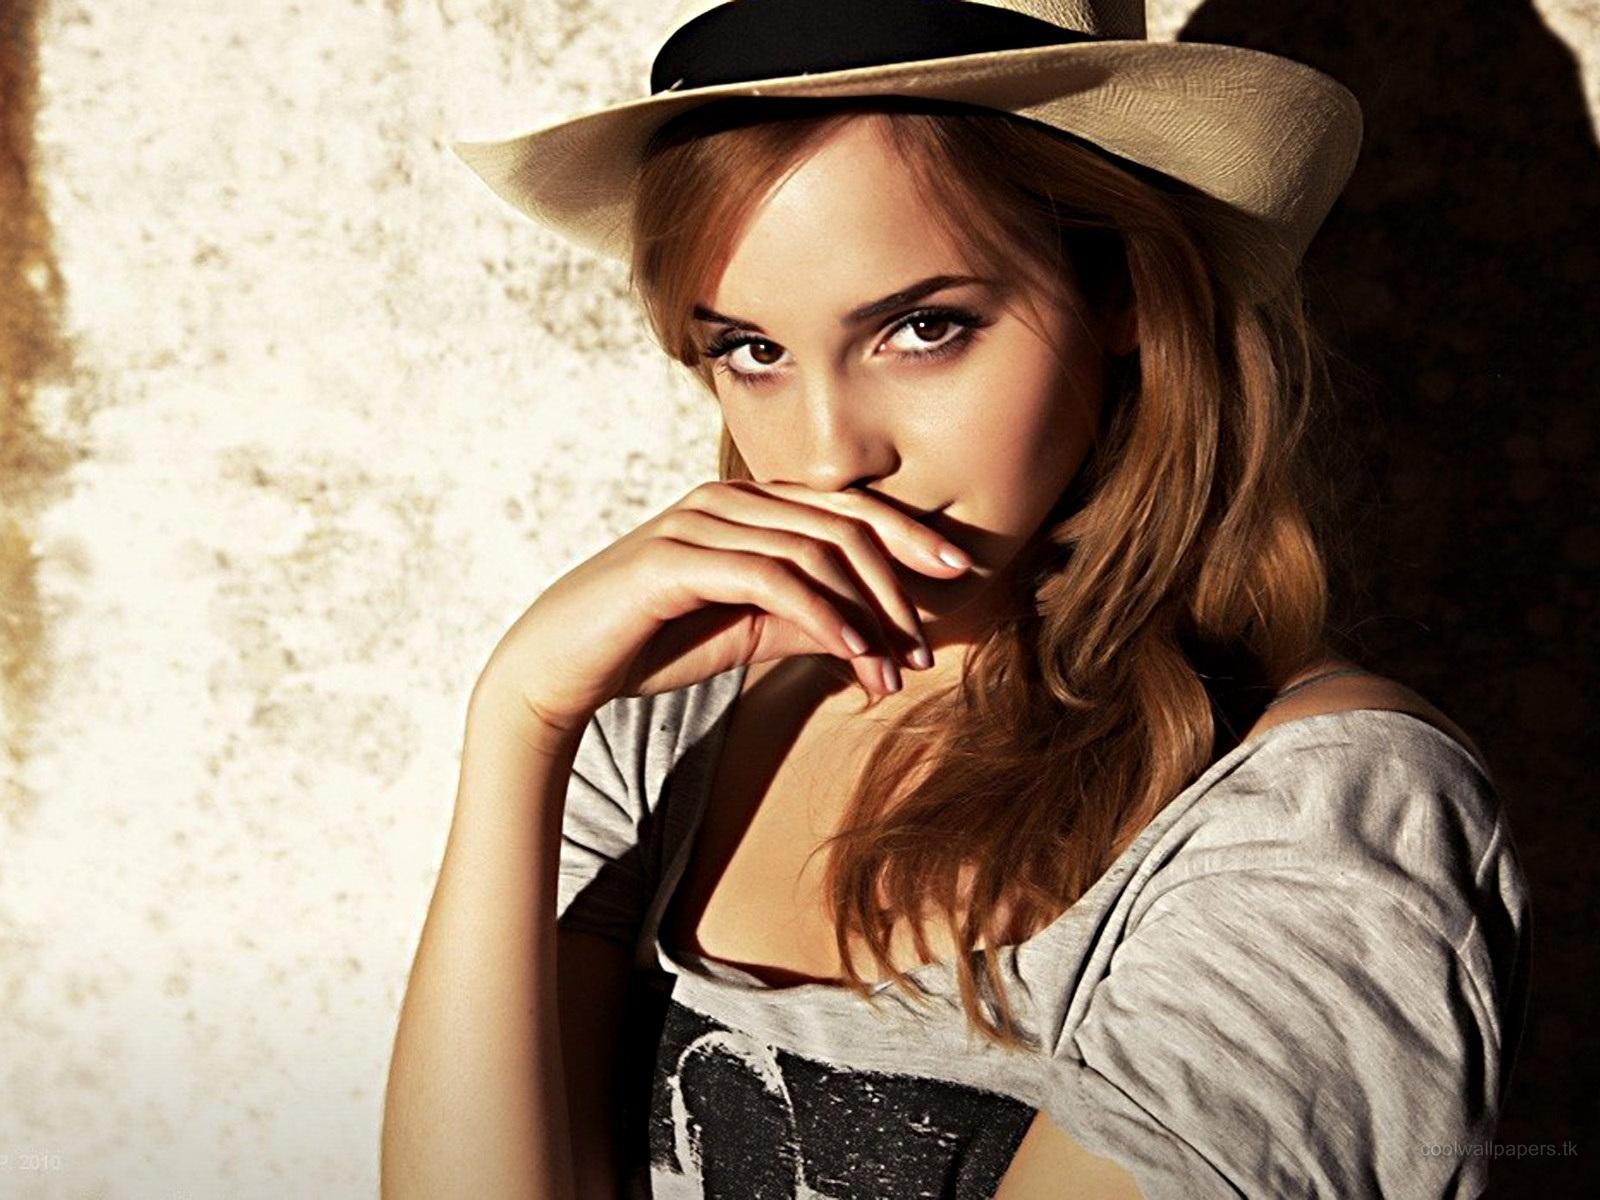 http://2.bp.blogspot.com/-8jeQjLXPLBE/TzX0ccyqKxI/AAAAAAAABSs/L9BLxrGDTK4/s1600/emma-watson+(11).jpg#Emma%20Watson%20hot%201600x1200